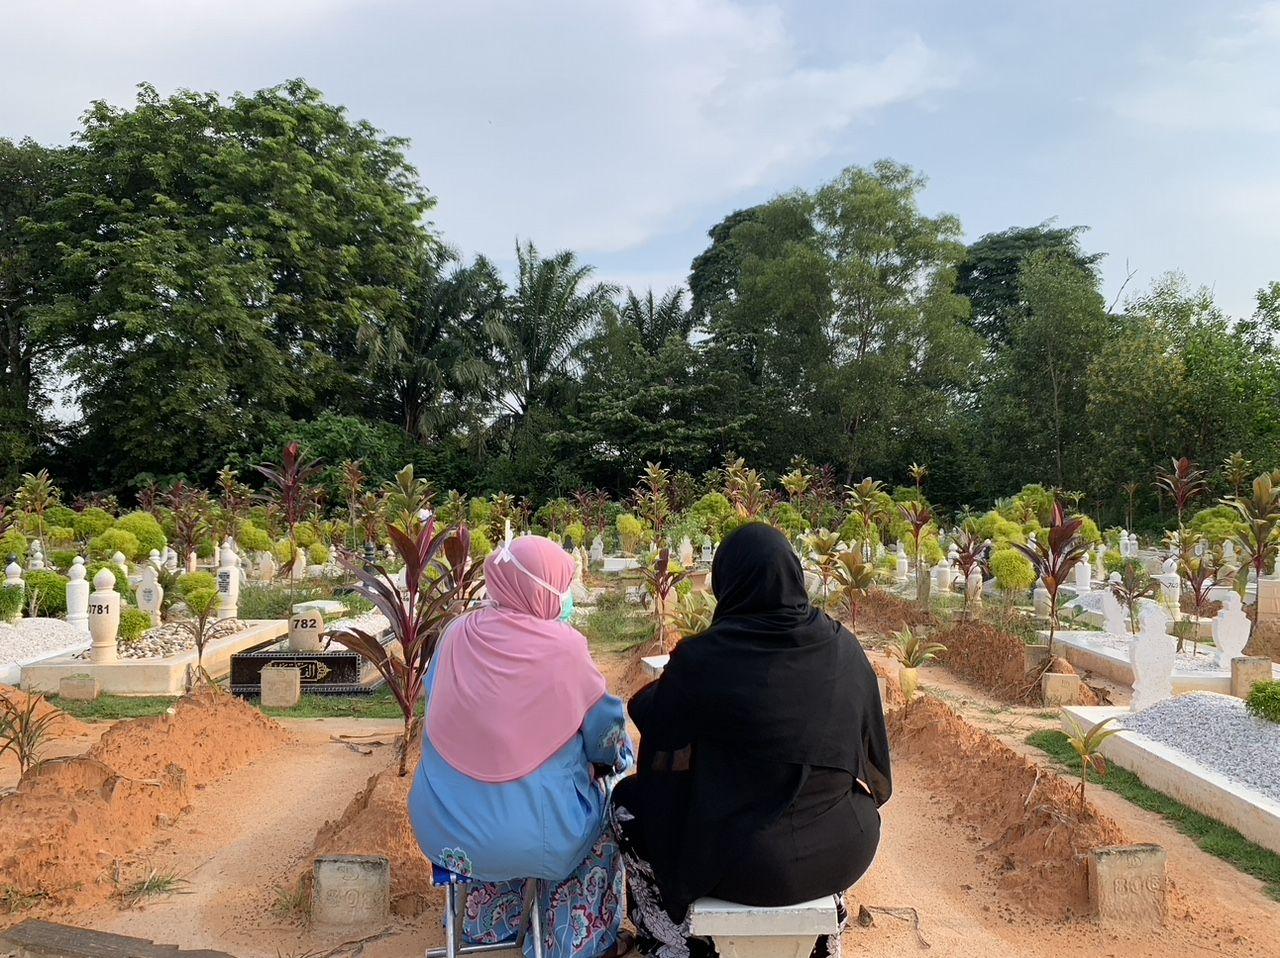 Malaysia Vs Covid 19: Director Zabrina Fernandez's Eye-Opening Documentary